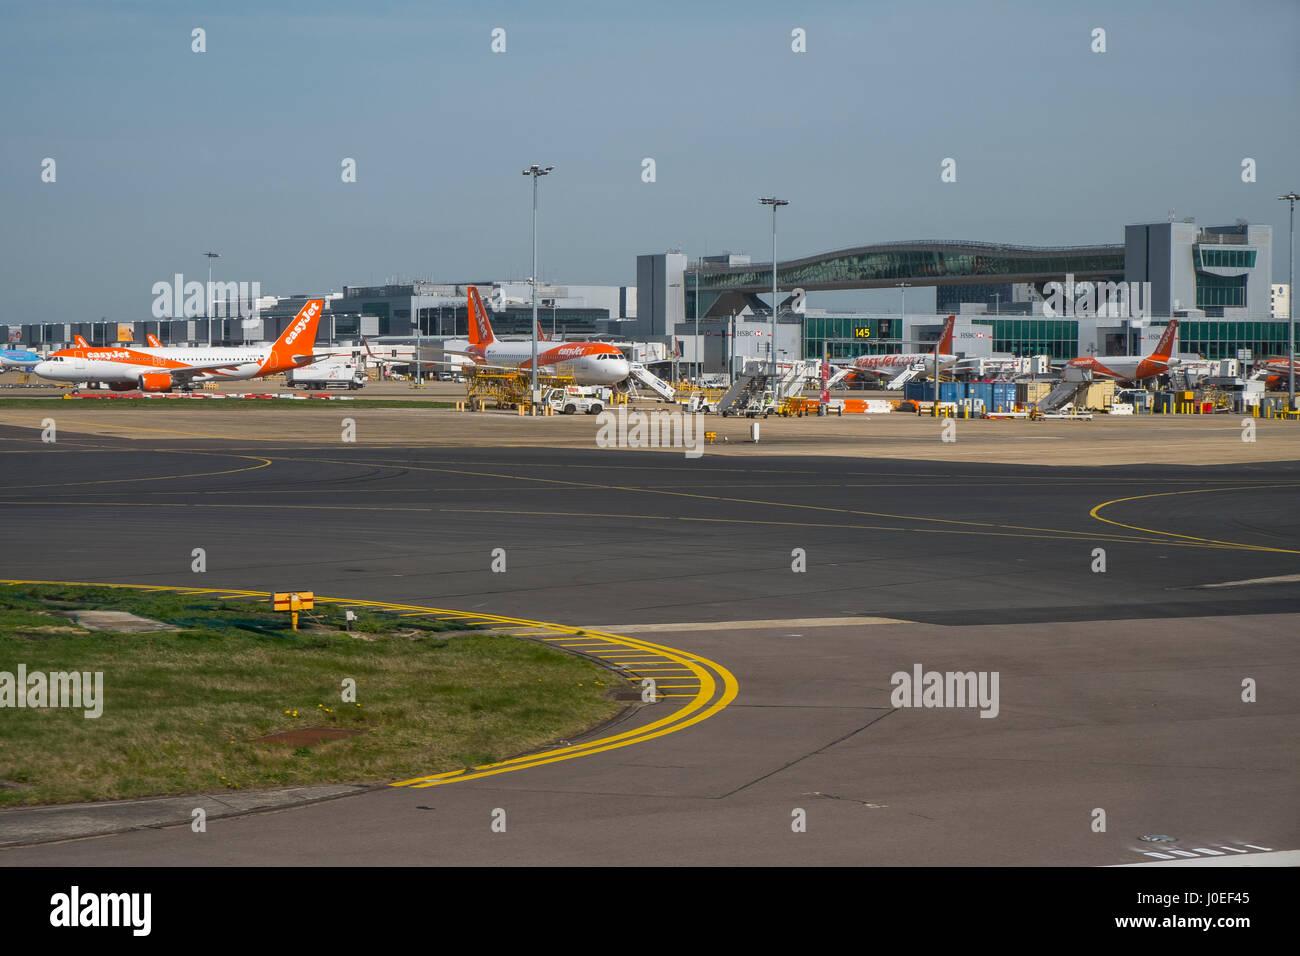 gatwick airport - Stock Image